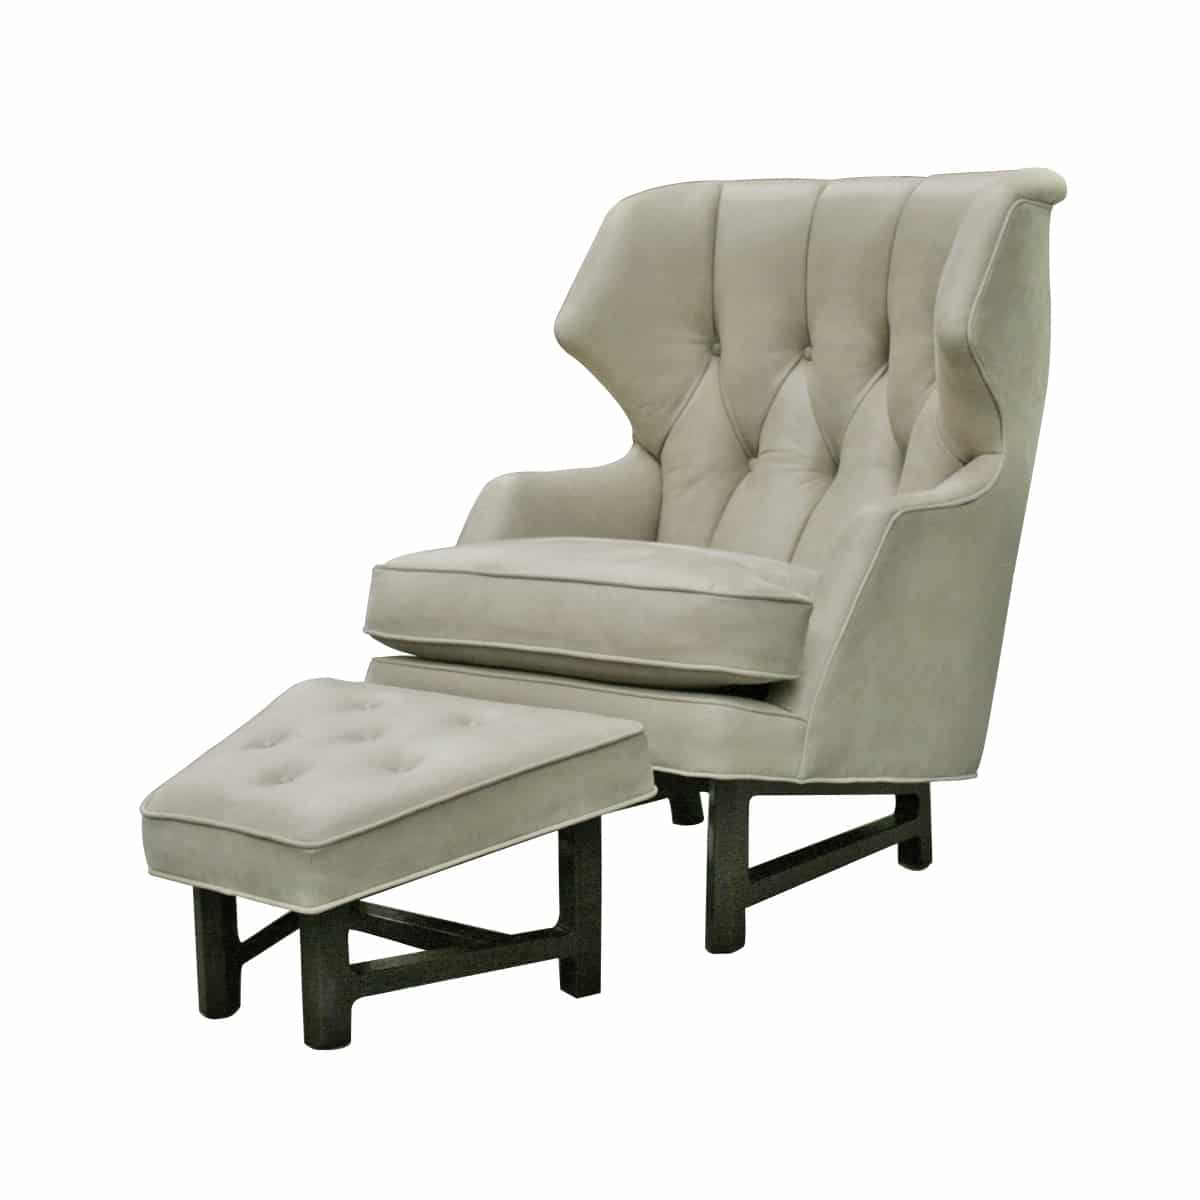 Edward wormley dunbar lounge chair and ottoman todd merrill studio - Edward wormley chairs ...